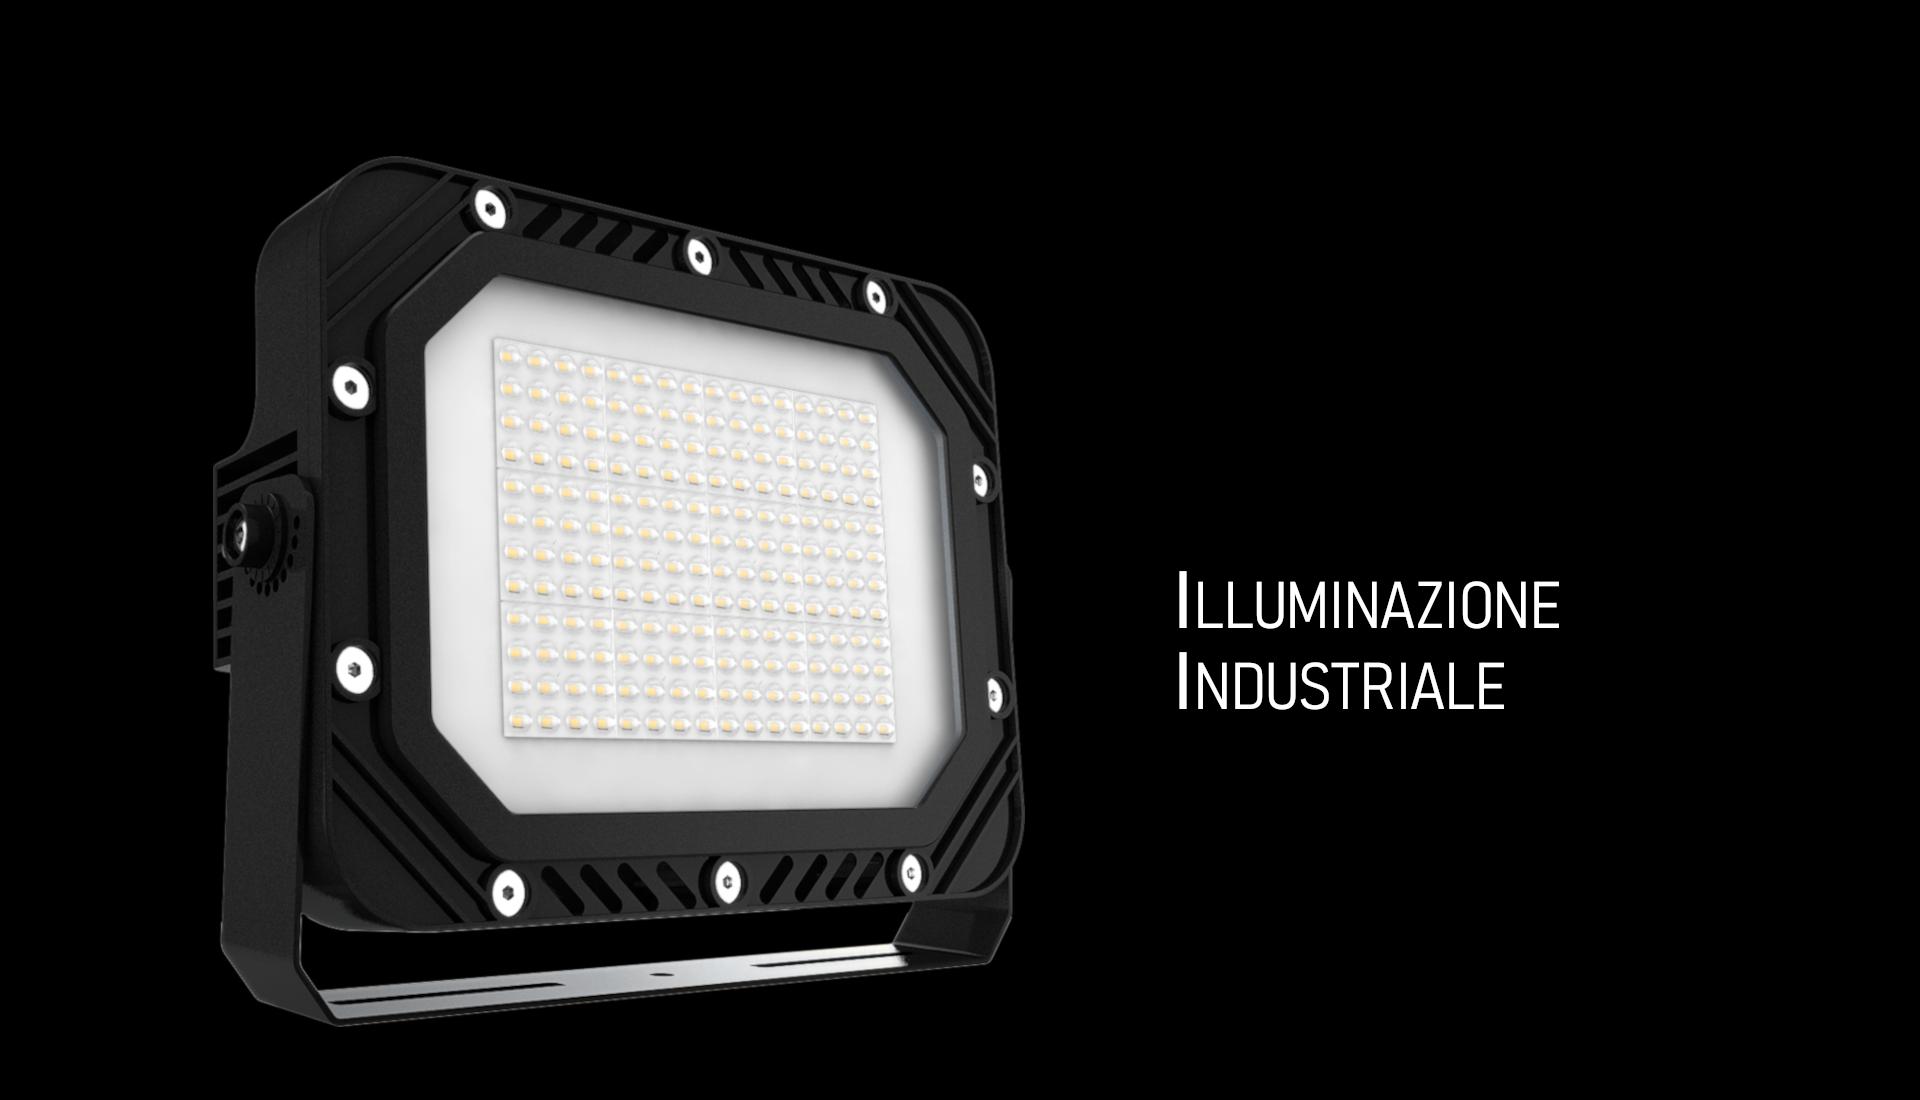 illuminazione_industriale